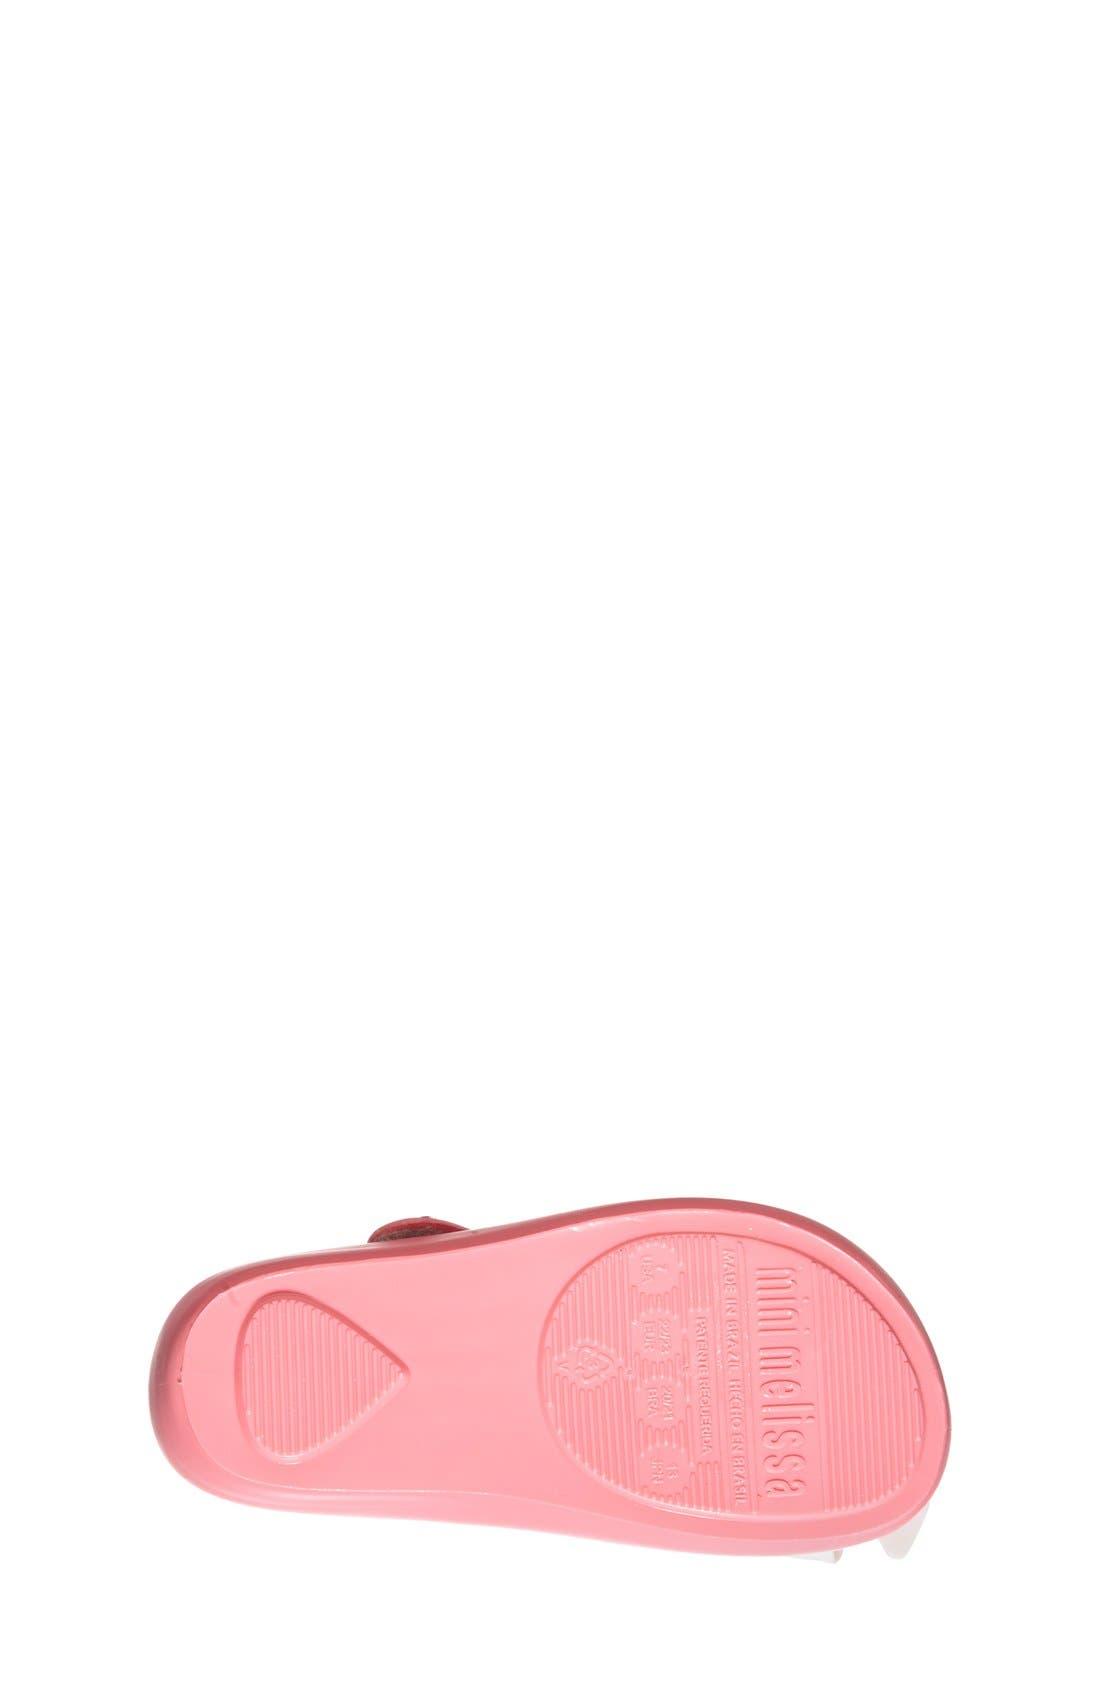 'Ultragirl Bow' Mary Jane Flat,                             Alternate thumbnail 4, color,                             Pink White